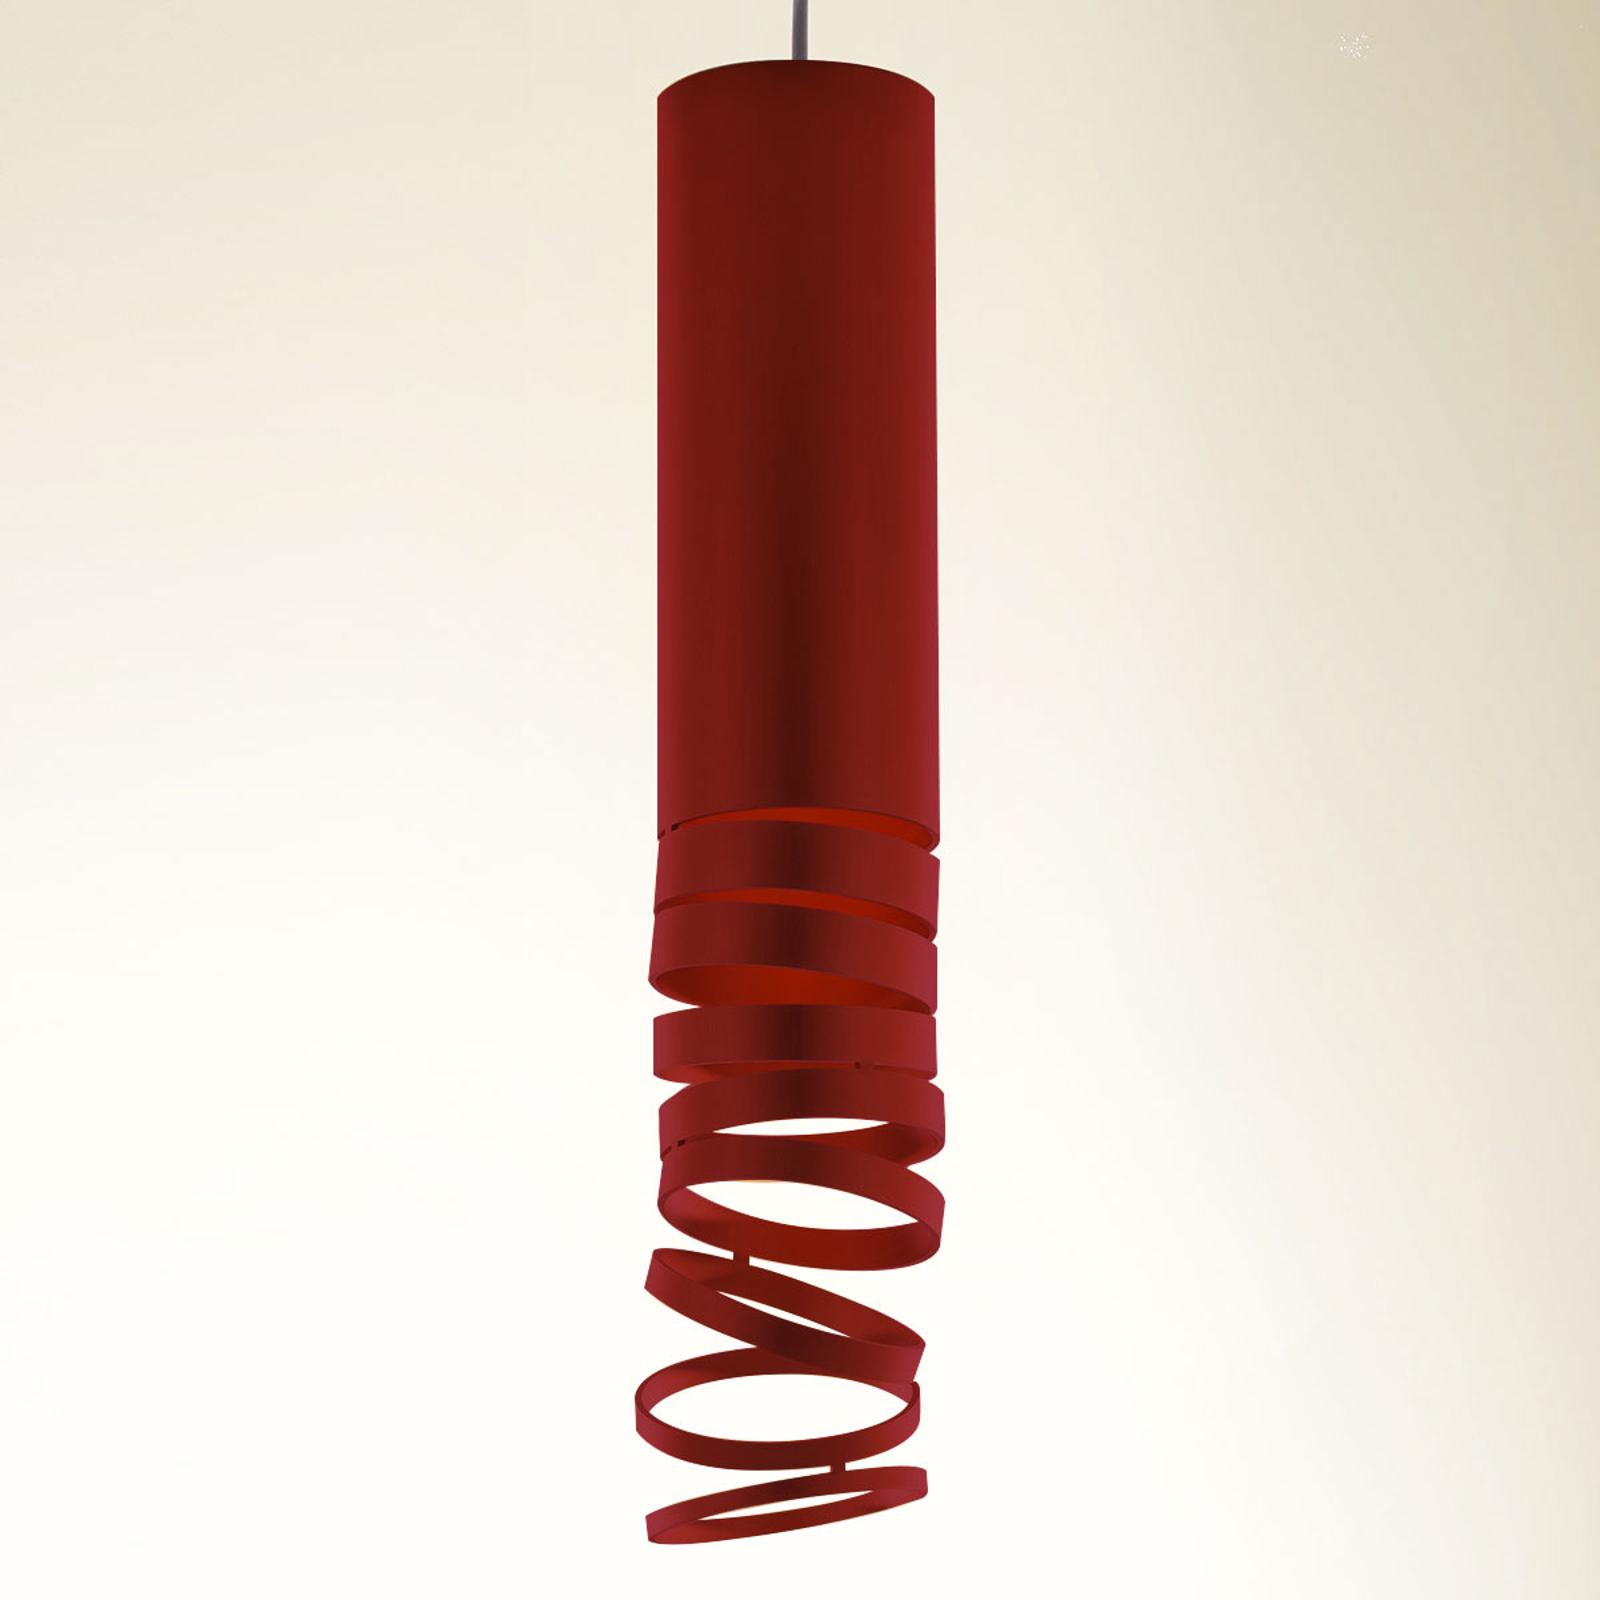 Artemide Decomposé Hängeleuchte rot